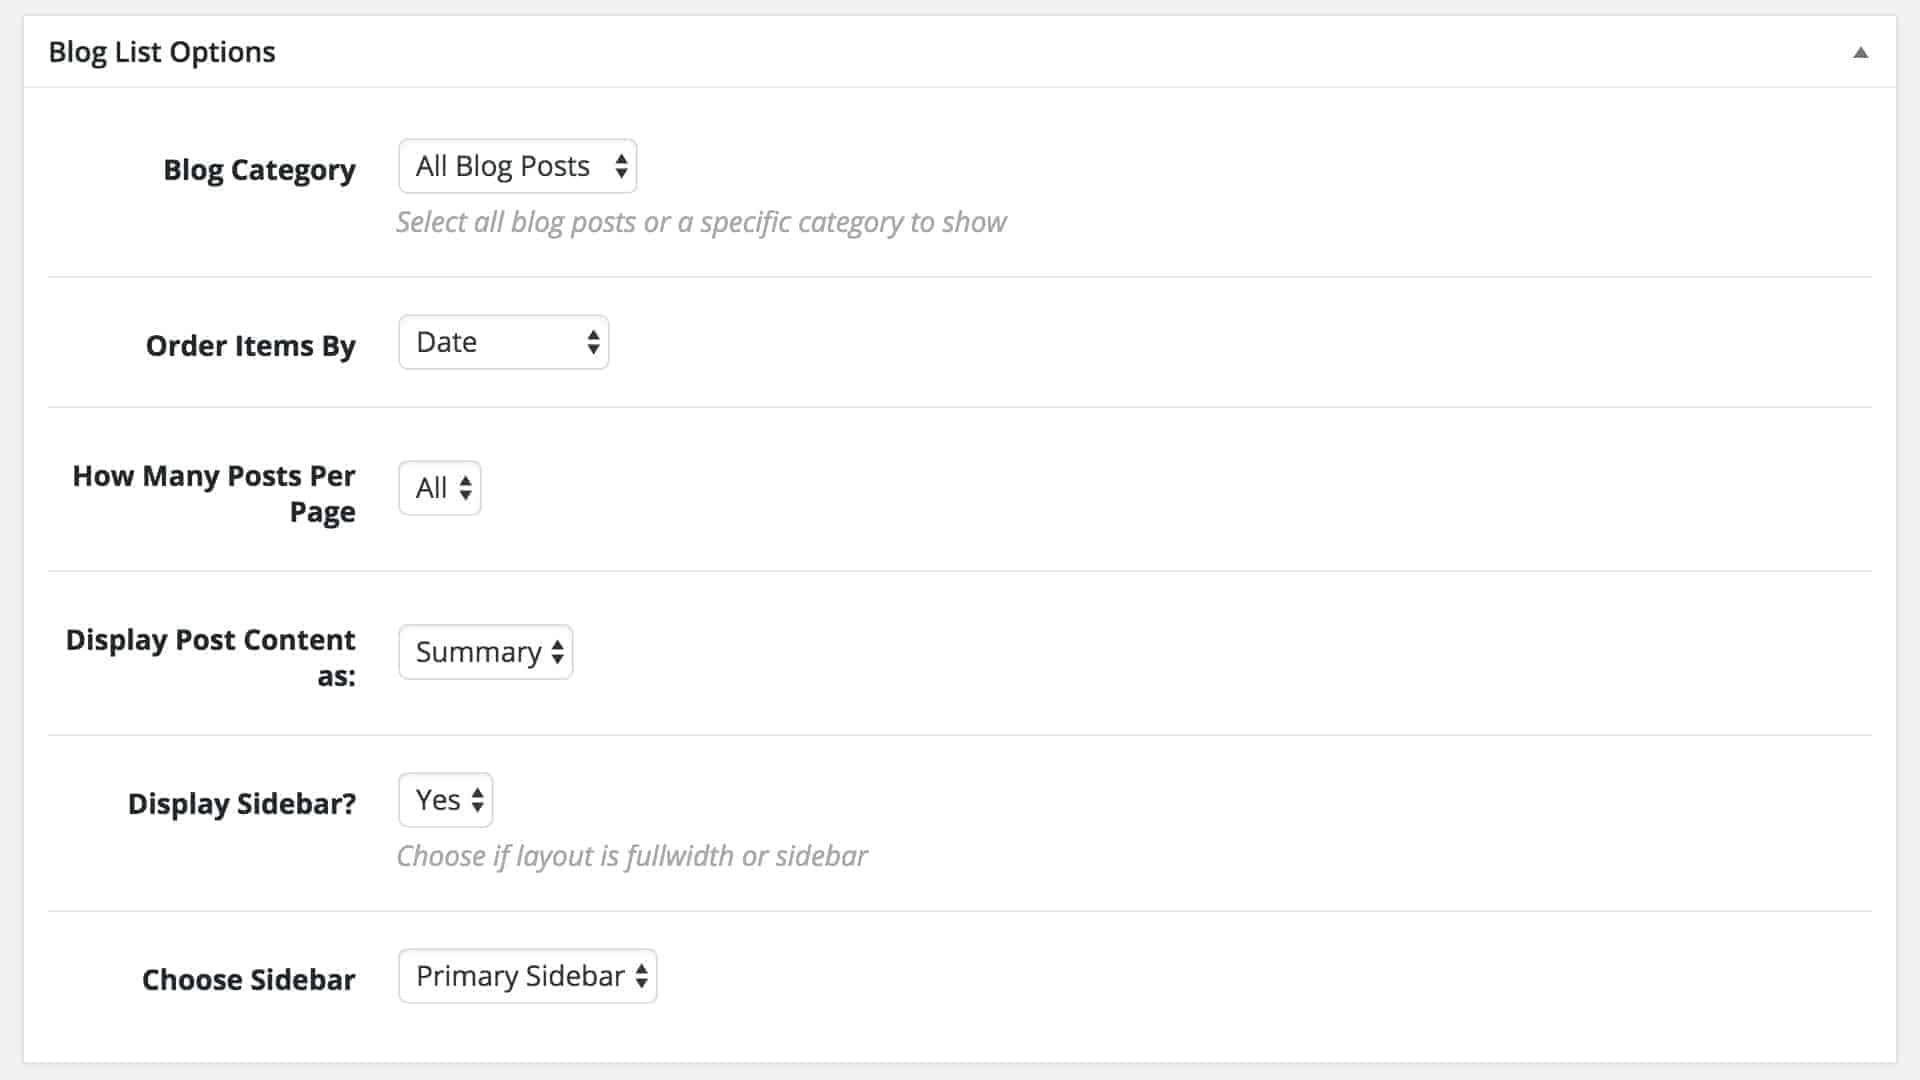 Blog List Options